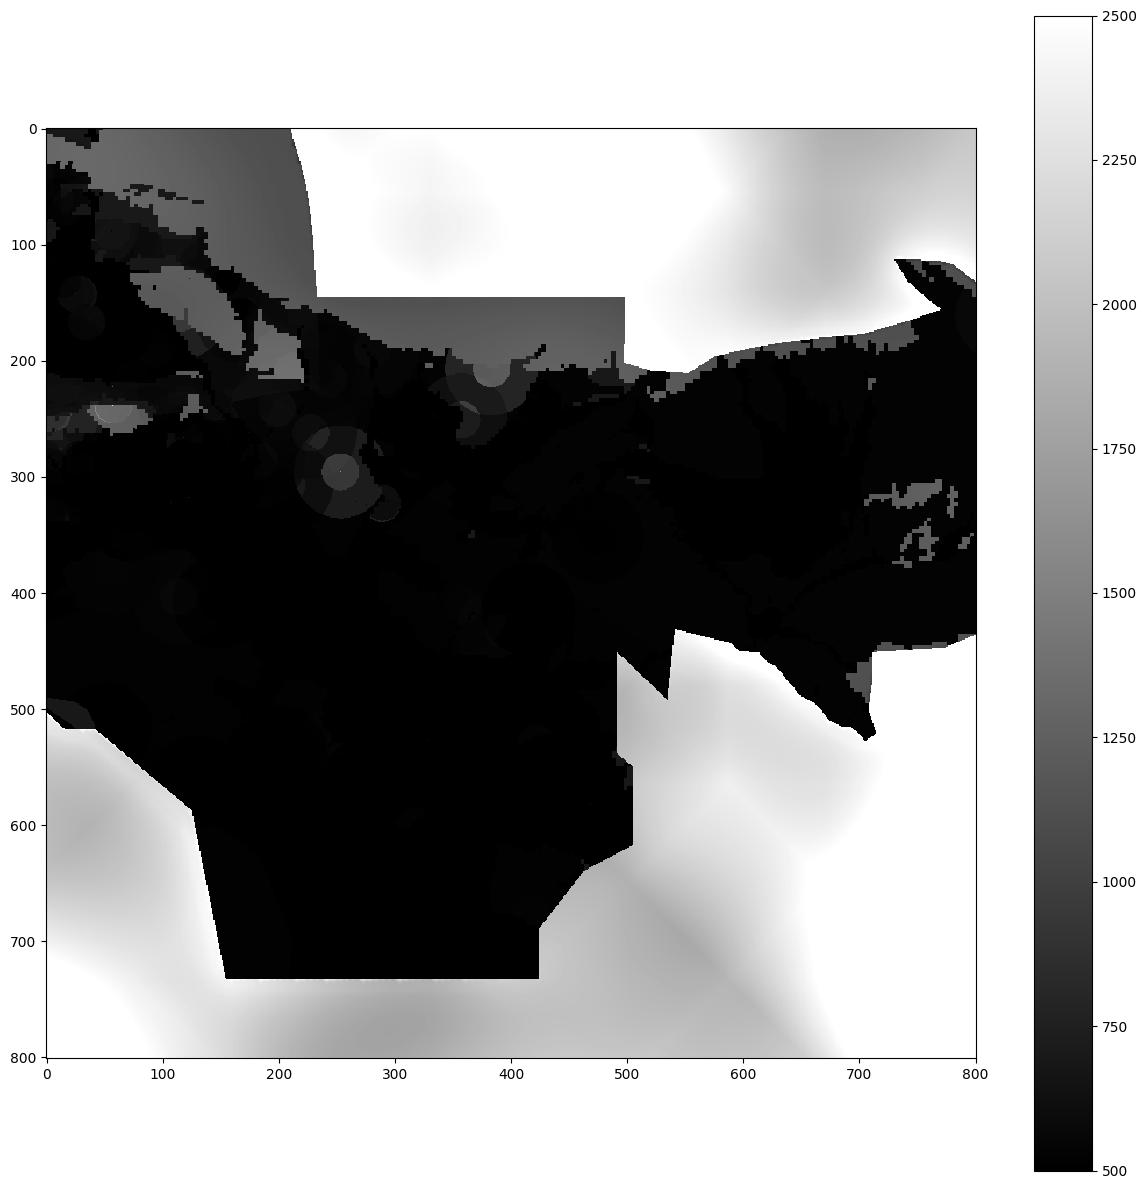 bench/seismic/wp/la_habra/meshes/velocity_model/plots/vs_25.png